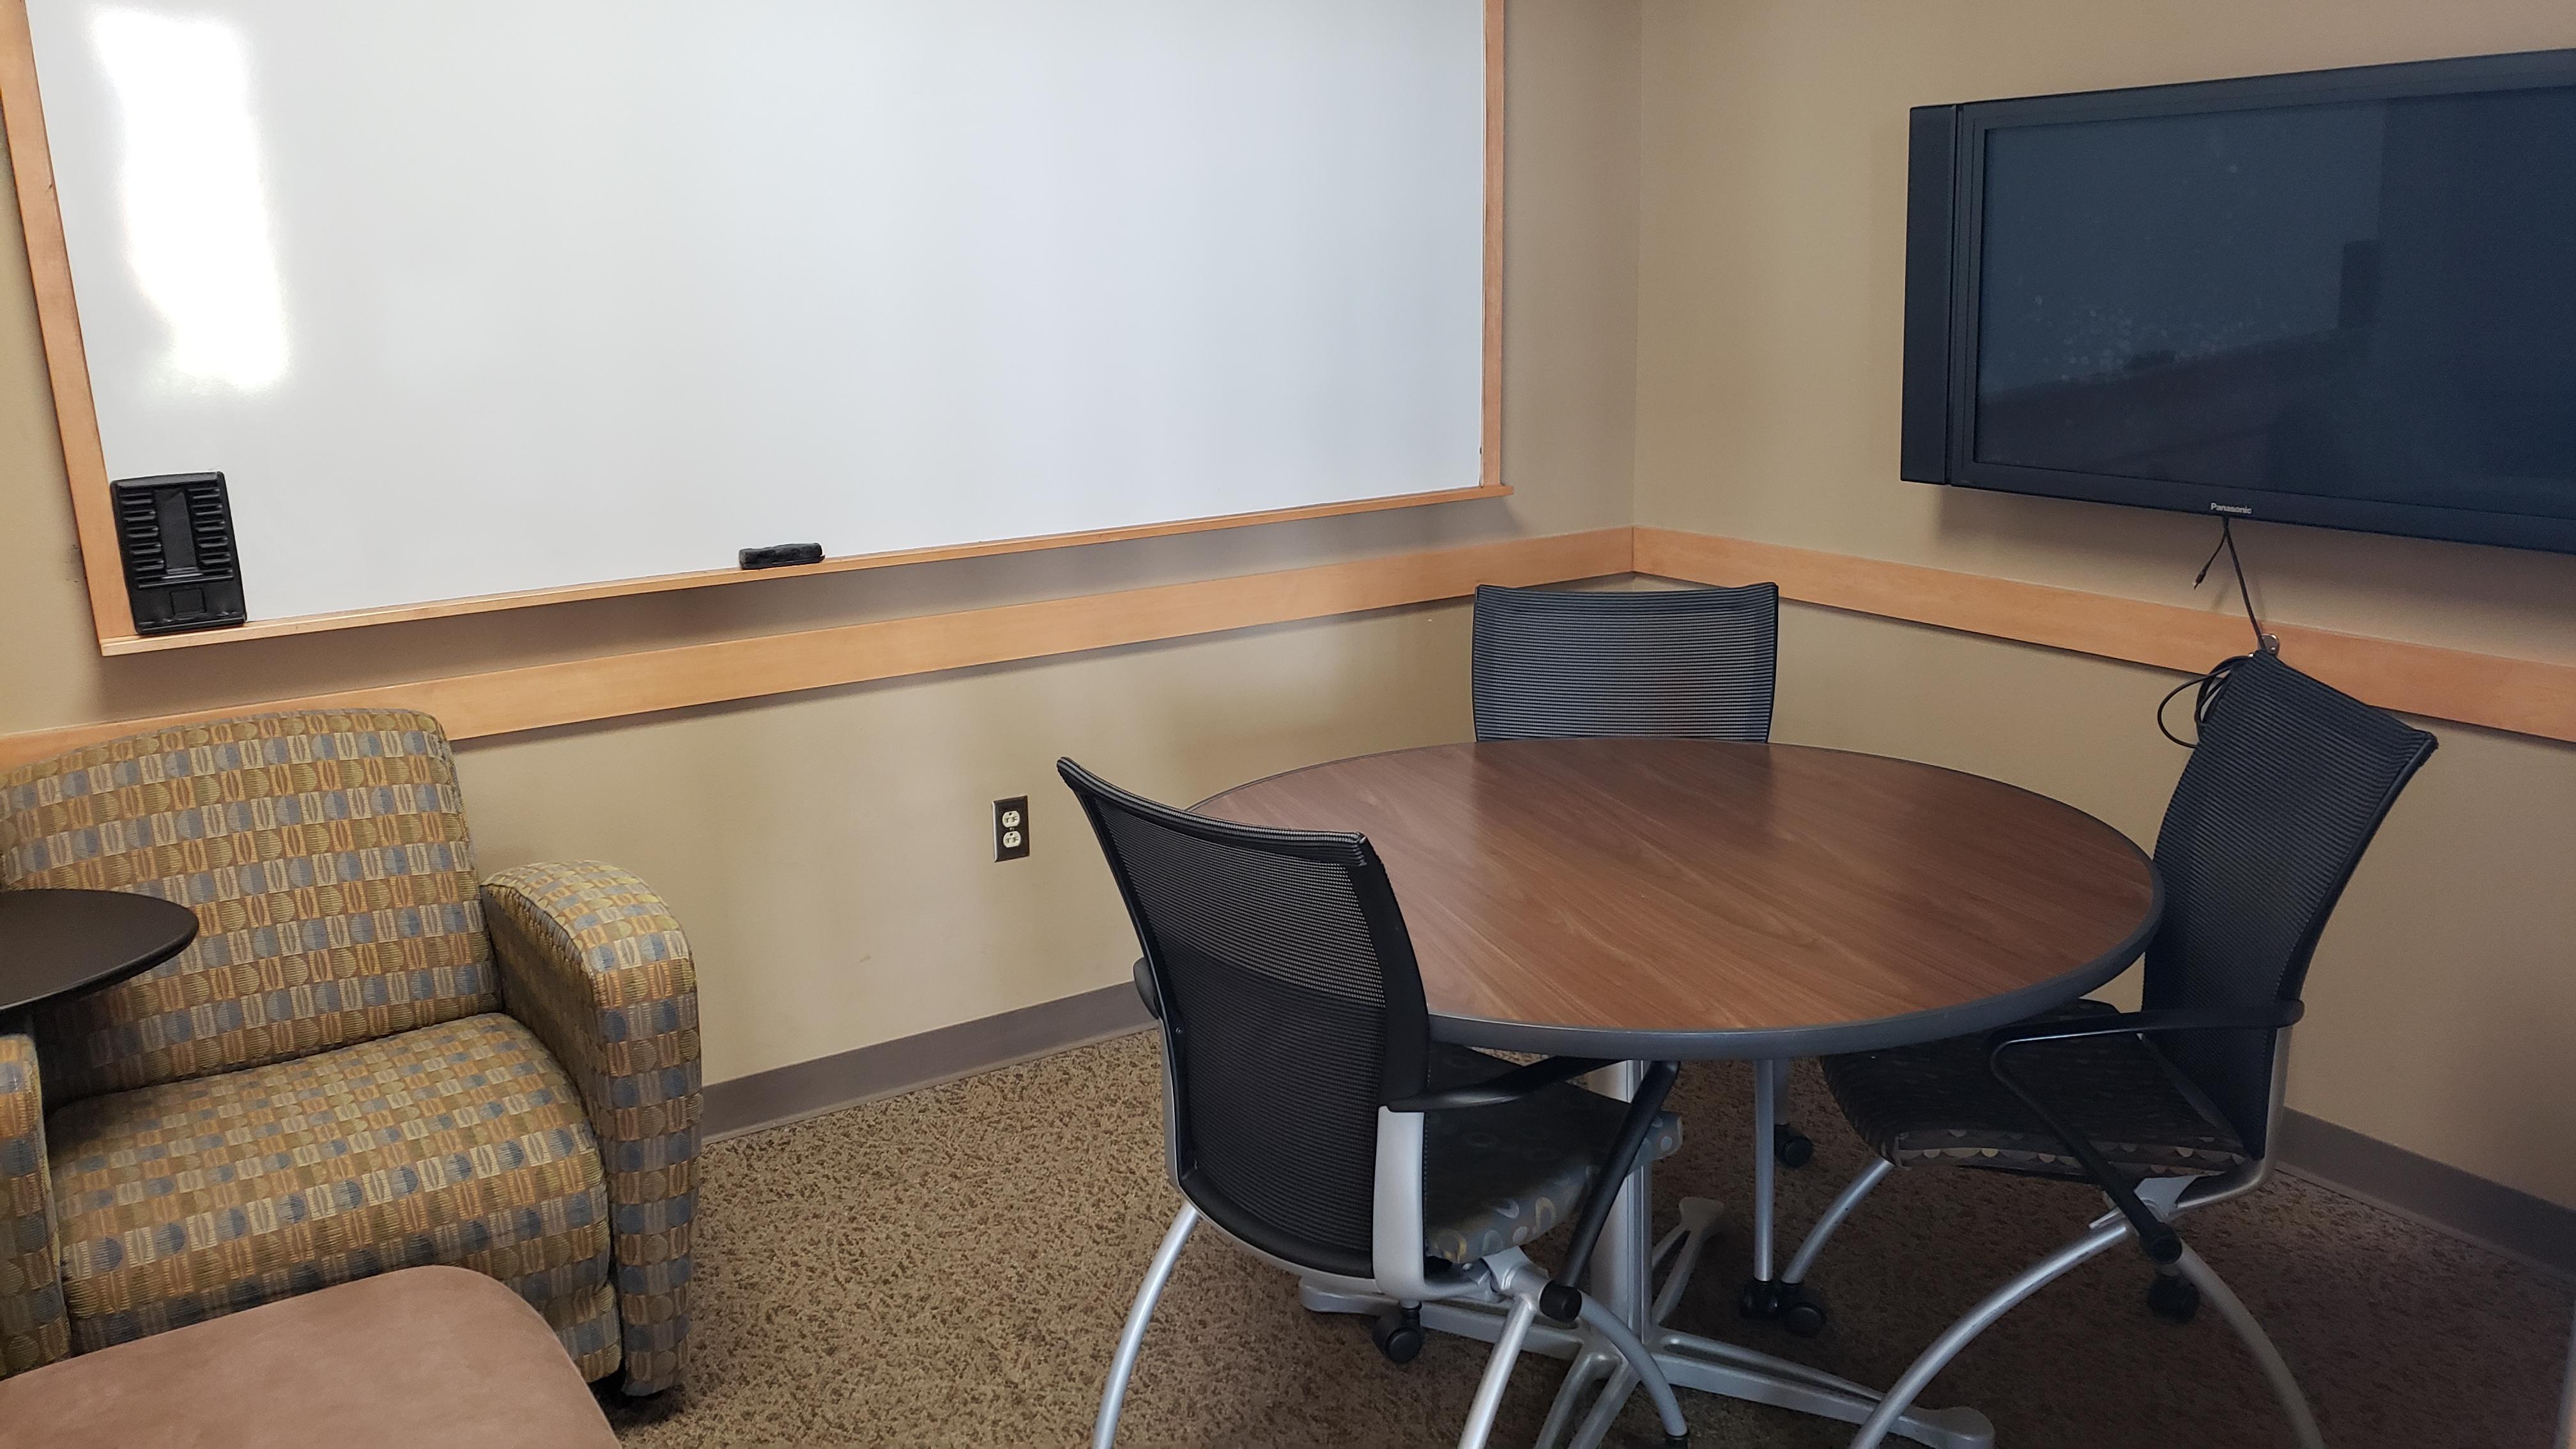 MEB Study Room